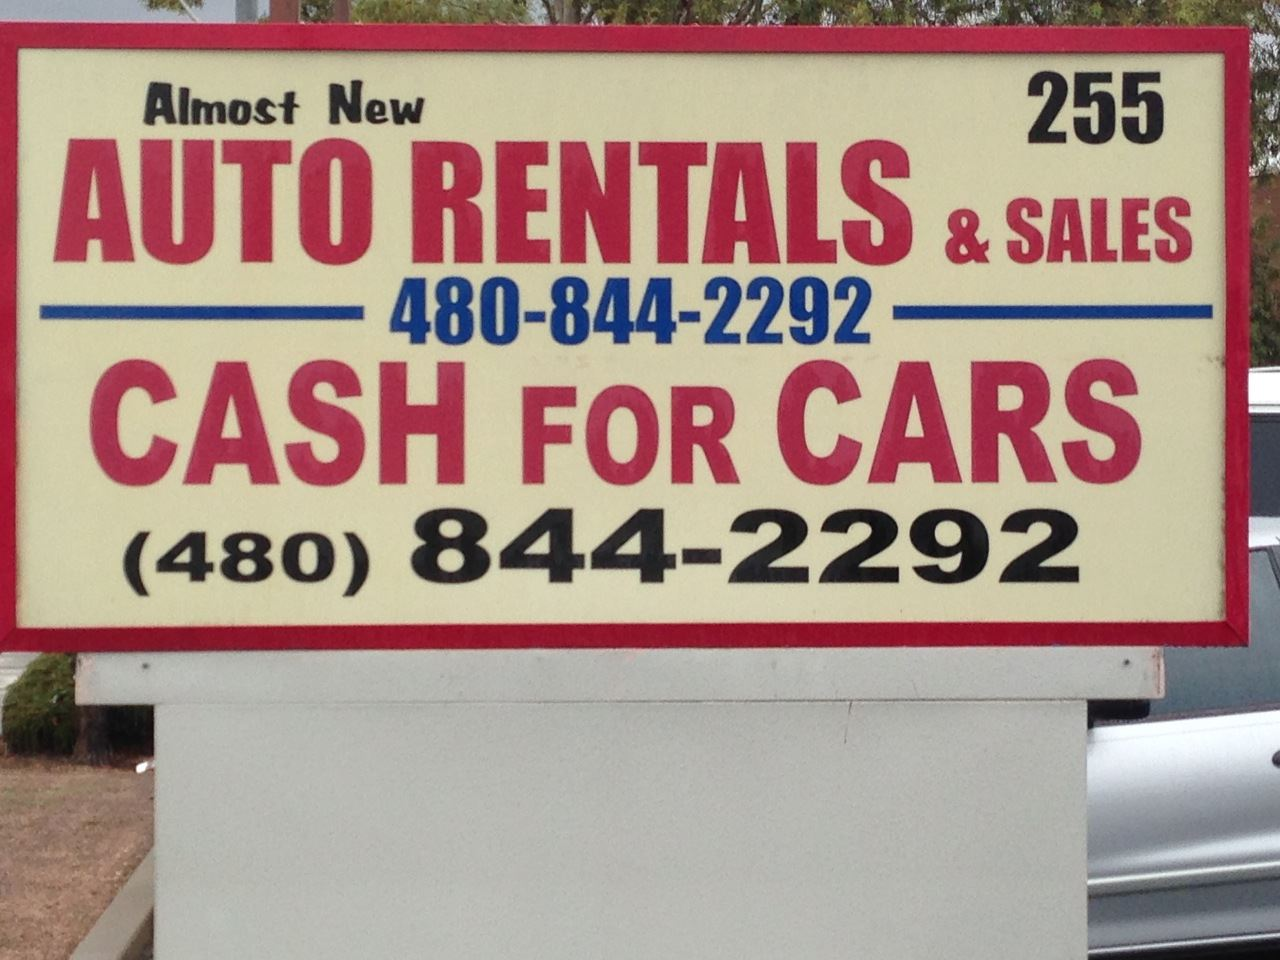 ALMOST NEW AUTO RENTALS & SALES